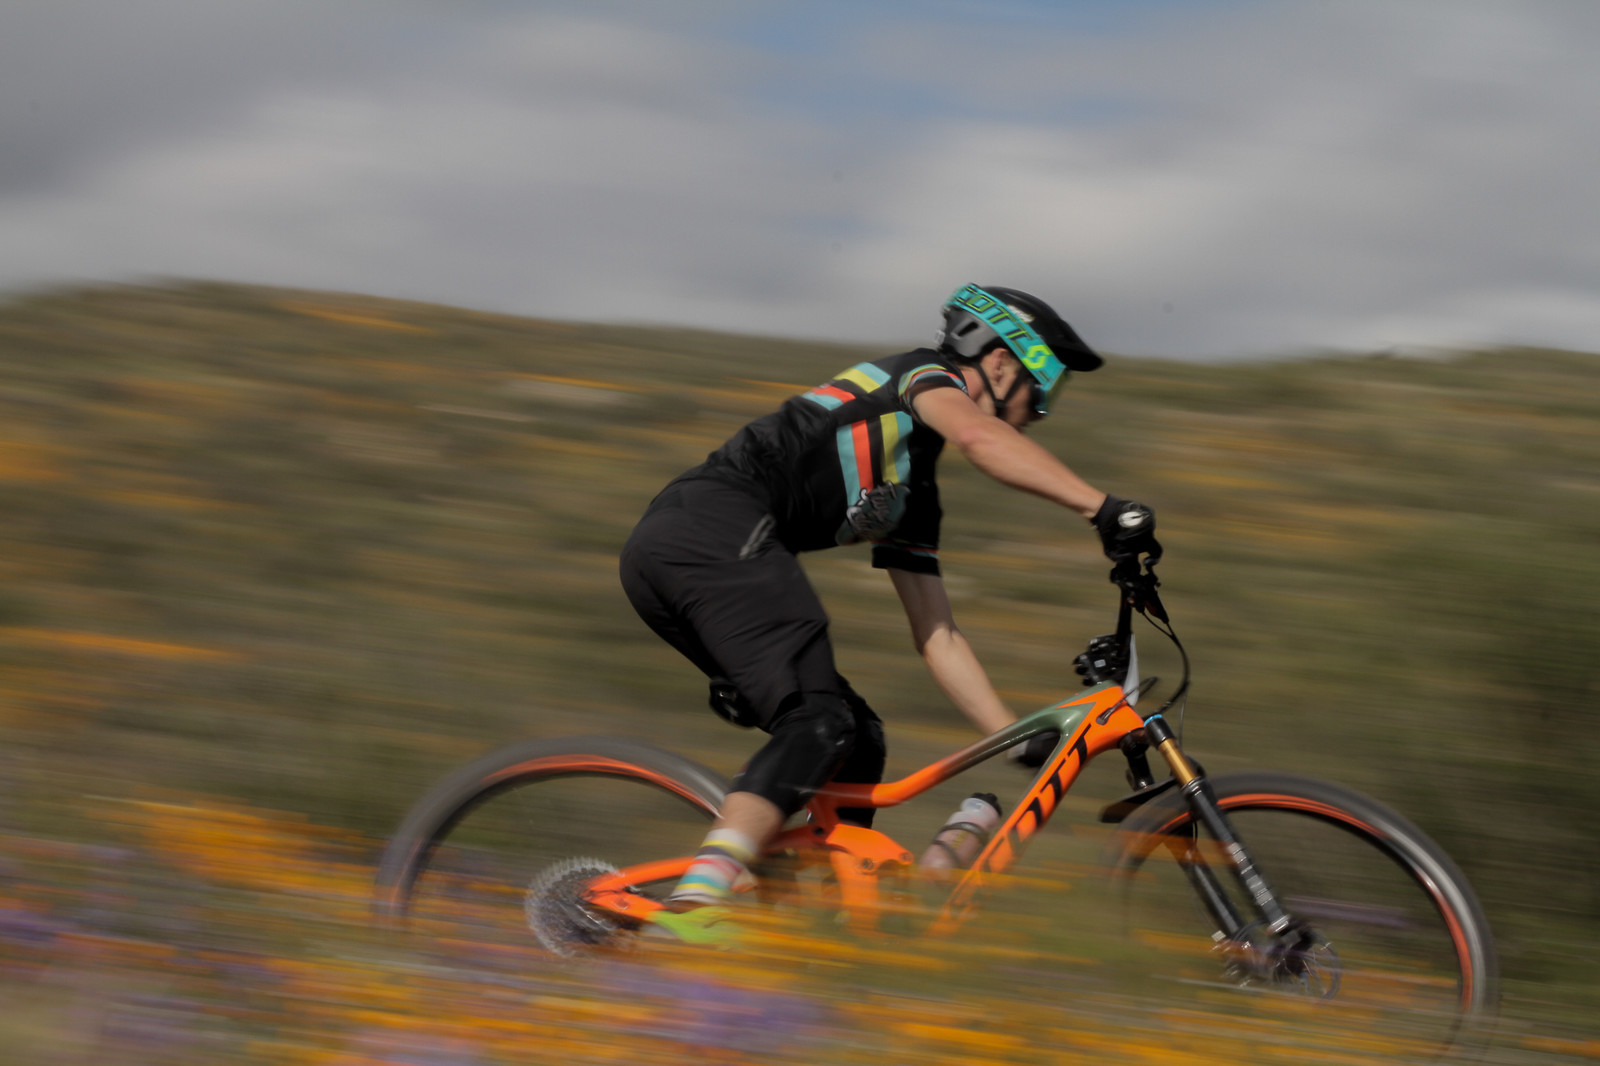 IMG 2072 - Liam Donohue - Mountain Biking Pictures - Vital MTB